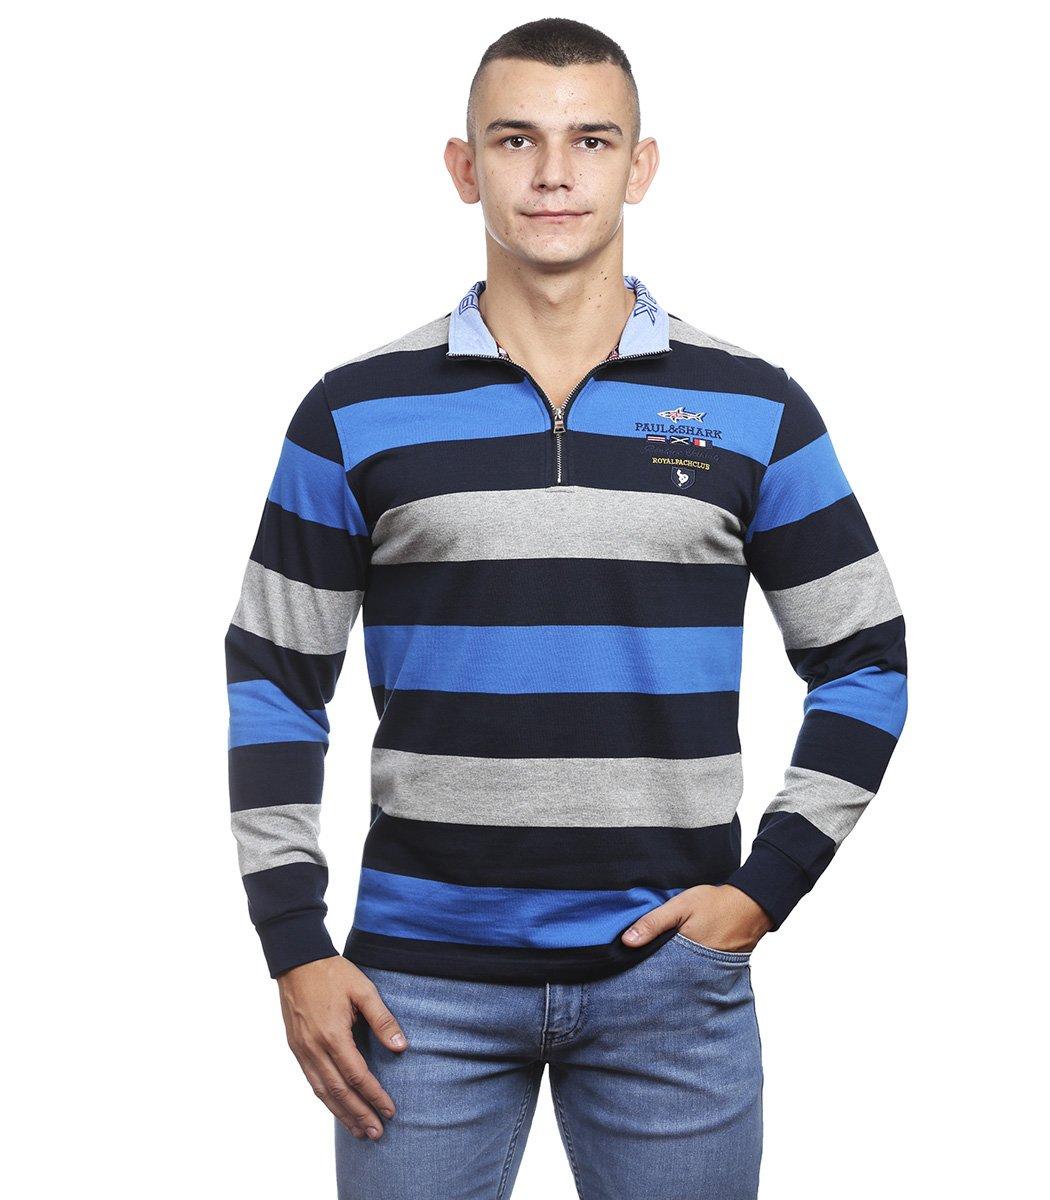 Кофта воротник стойка на молнии PAUL SHARK СР3 (синий/серый)